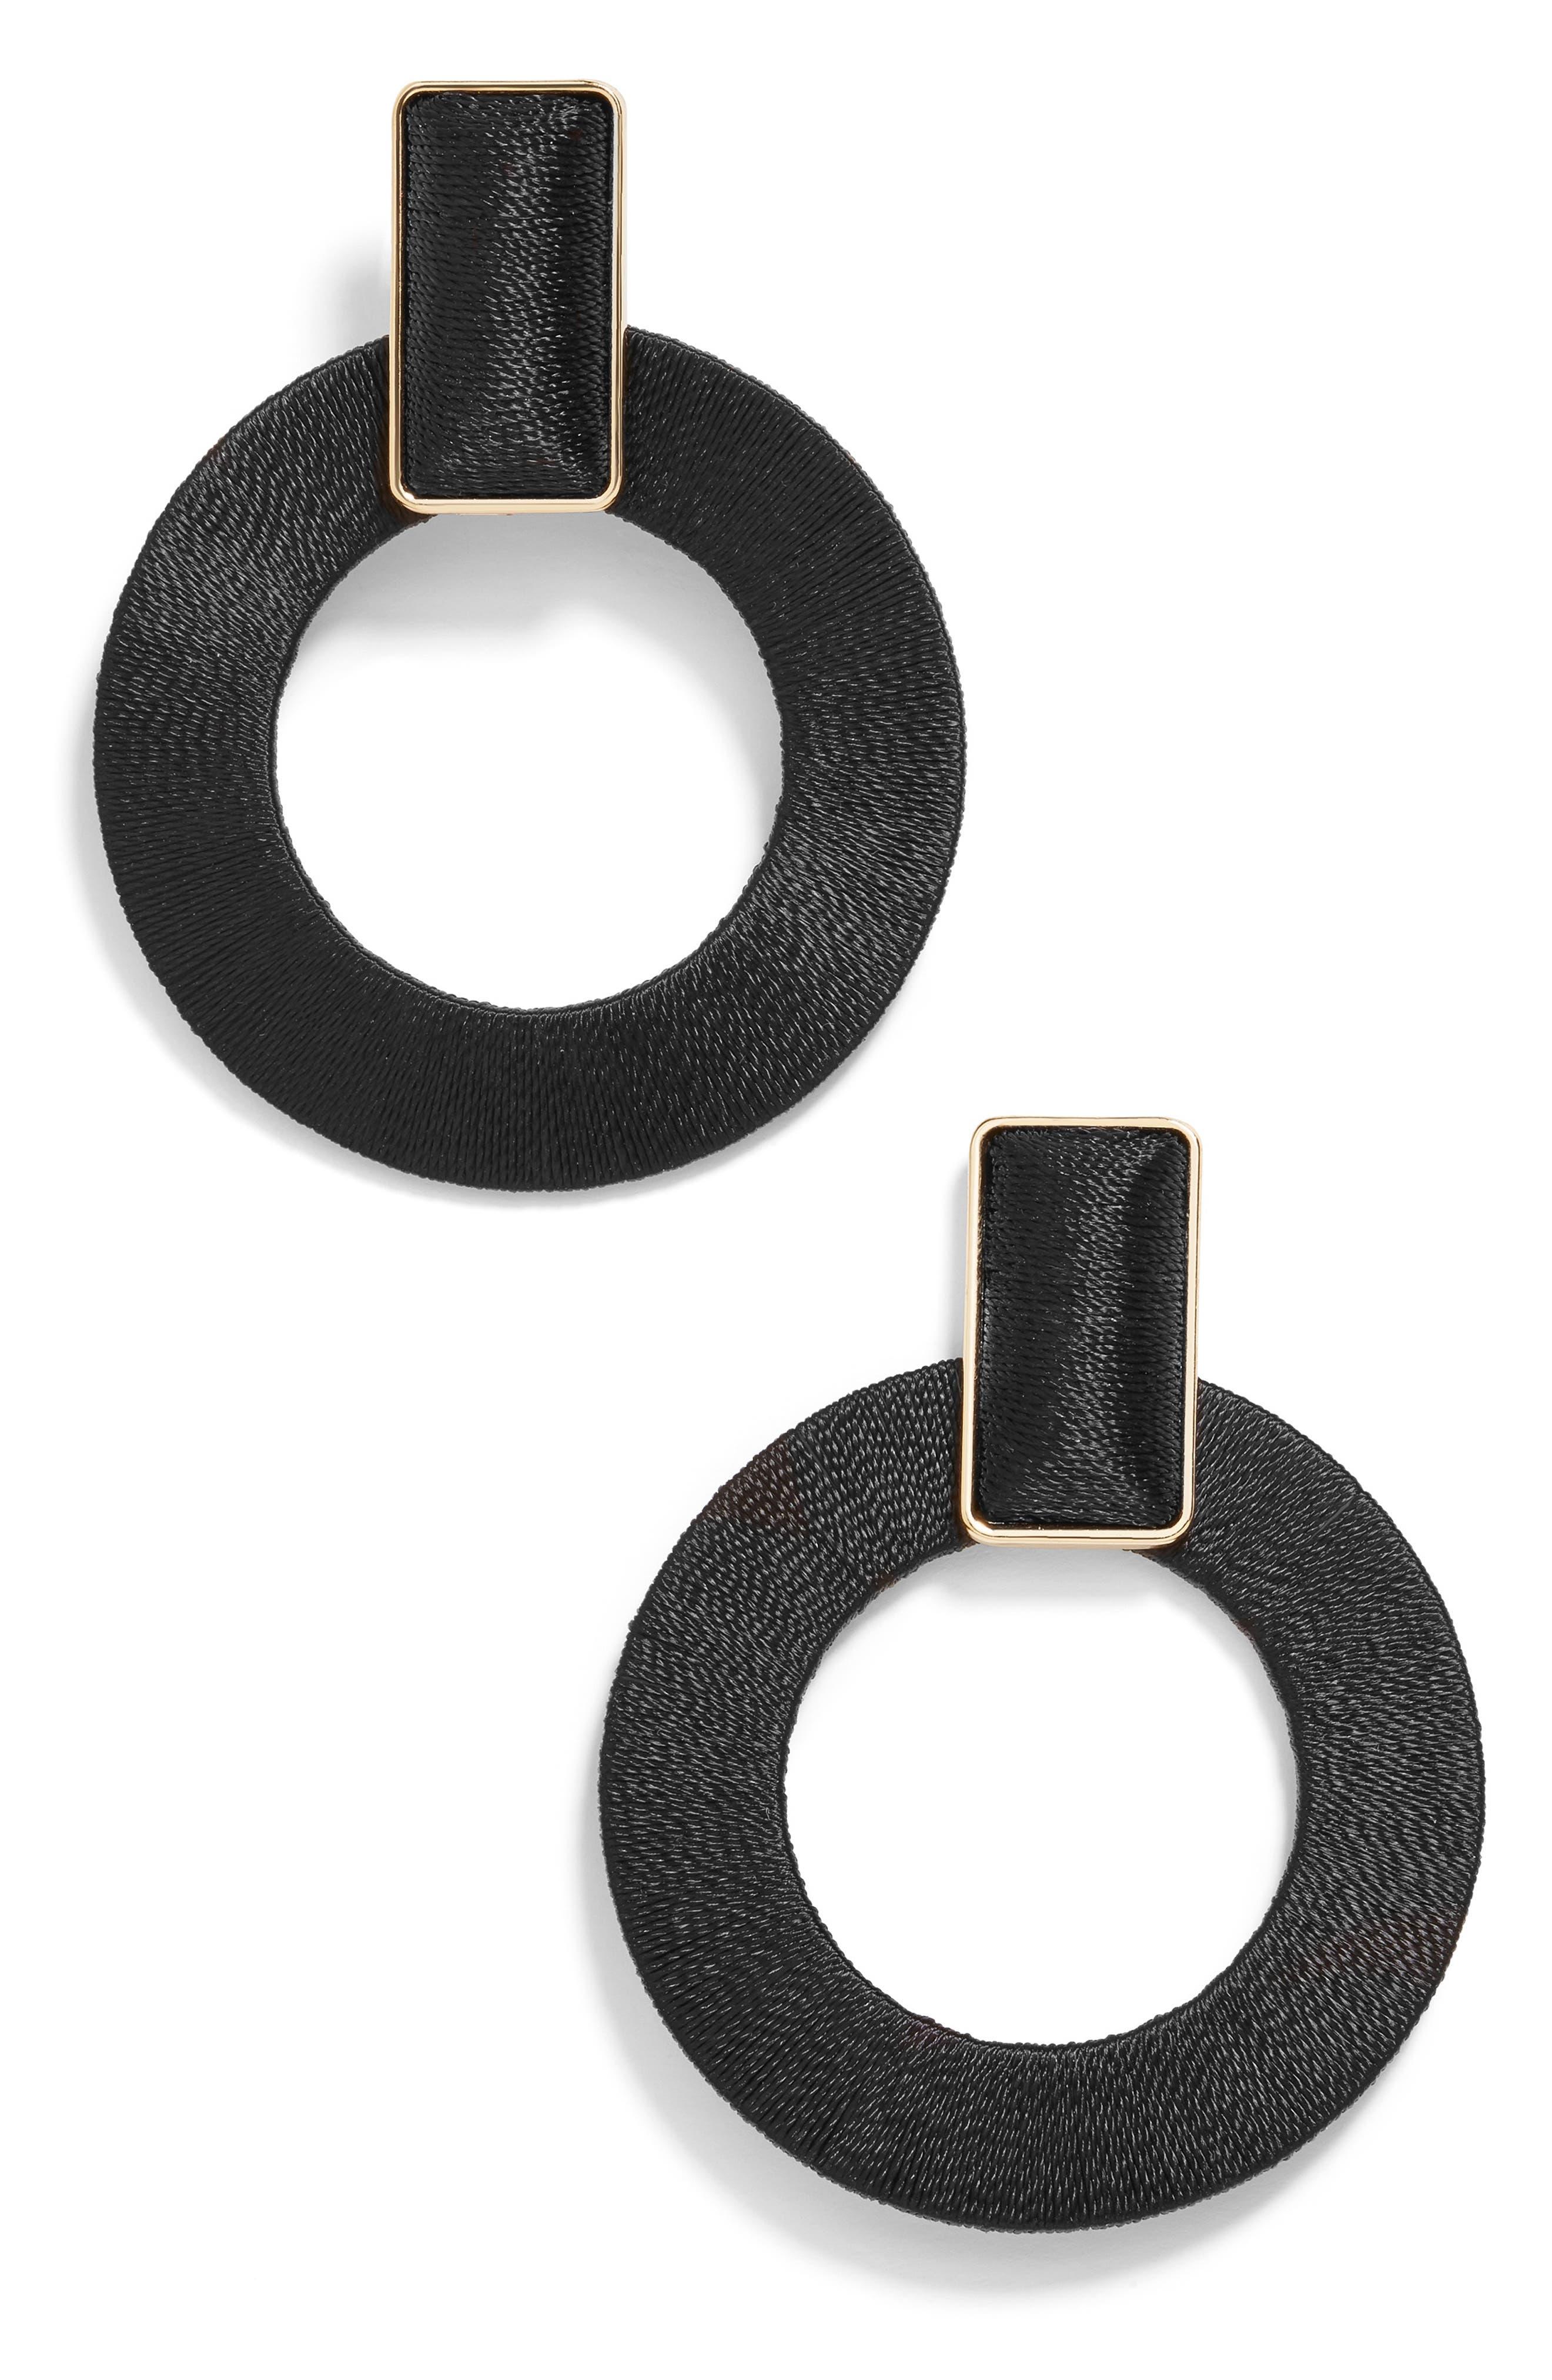 1960s Jewelry Styles and Trends to Wear Womens Baublebar Marisela Hoop Earrings $38.00 AT vintagedancer.com